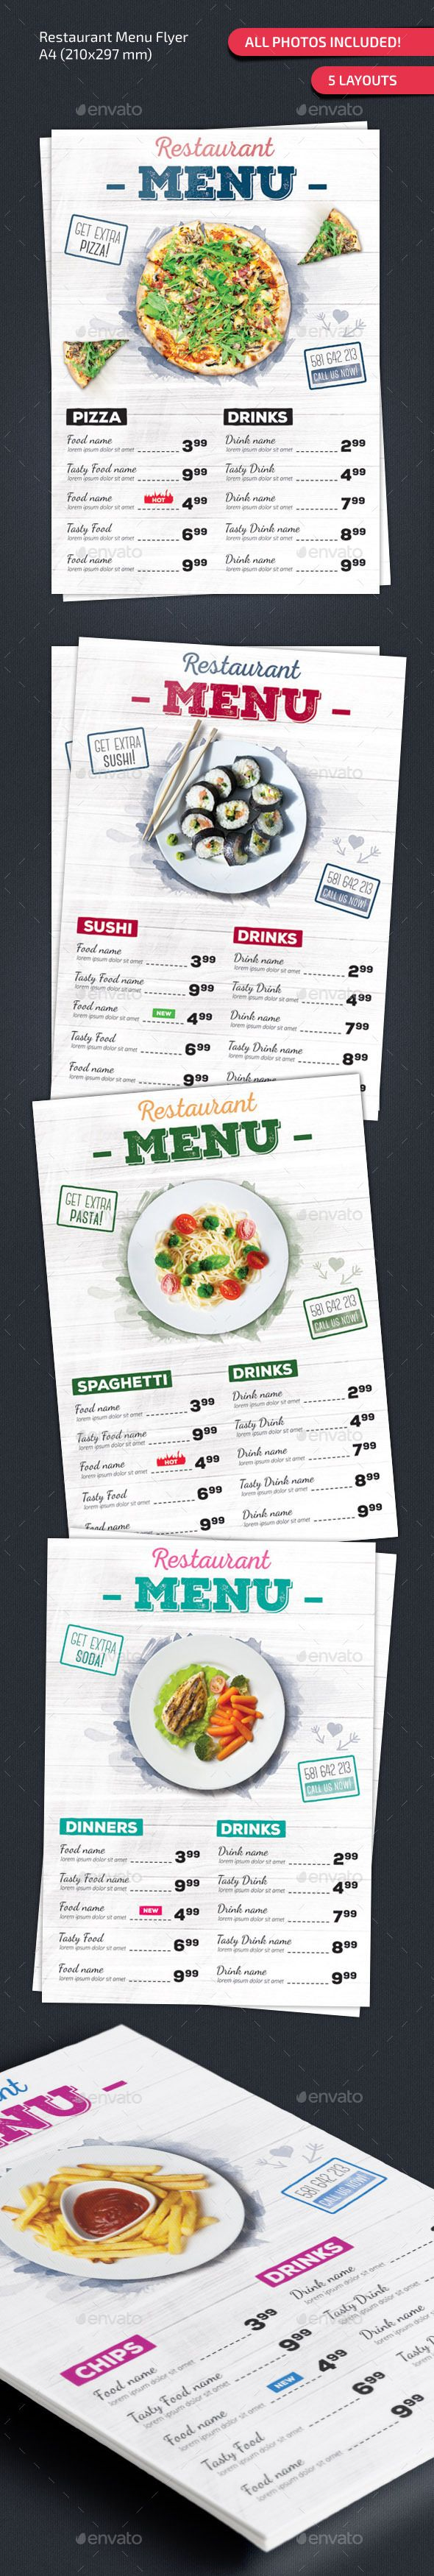 Restaurant Menu Design Tempalte Download: http://graphicriver.net/item/restaurant-menu/12943428?ref=ksioks